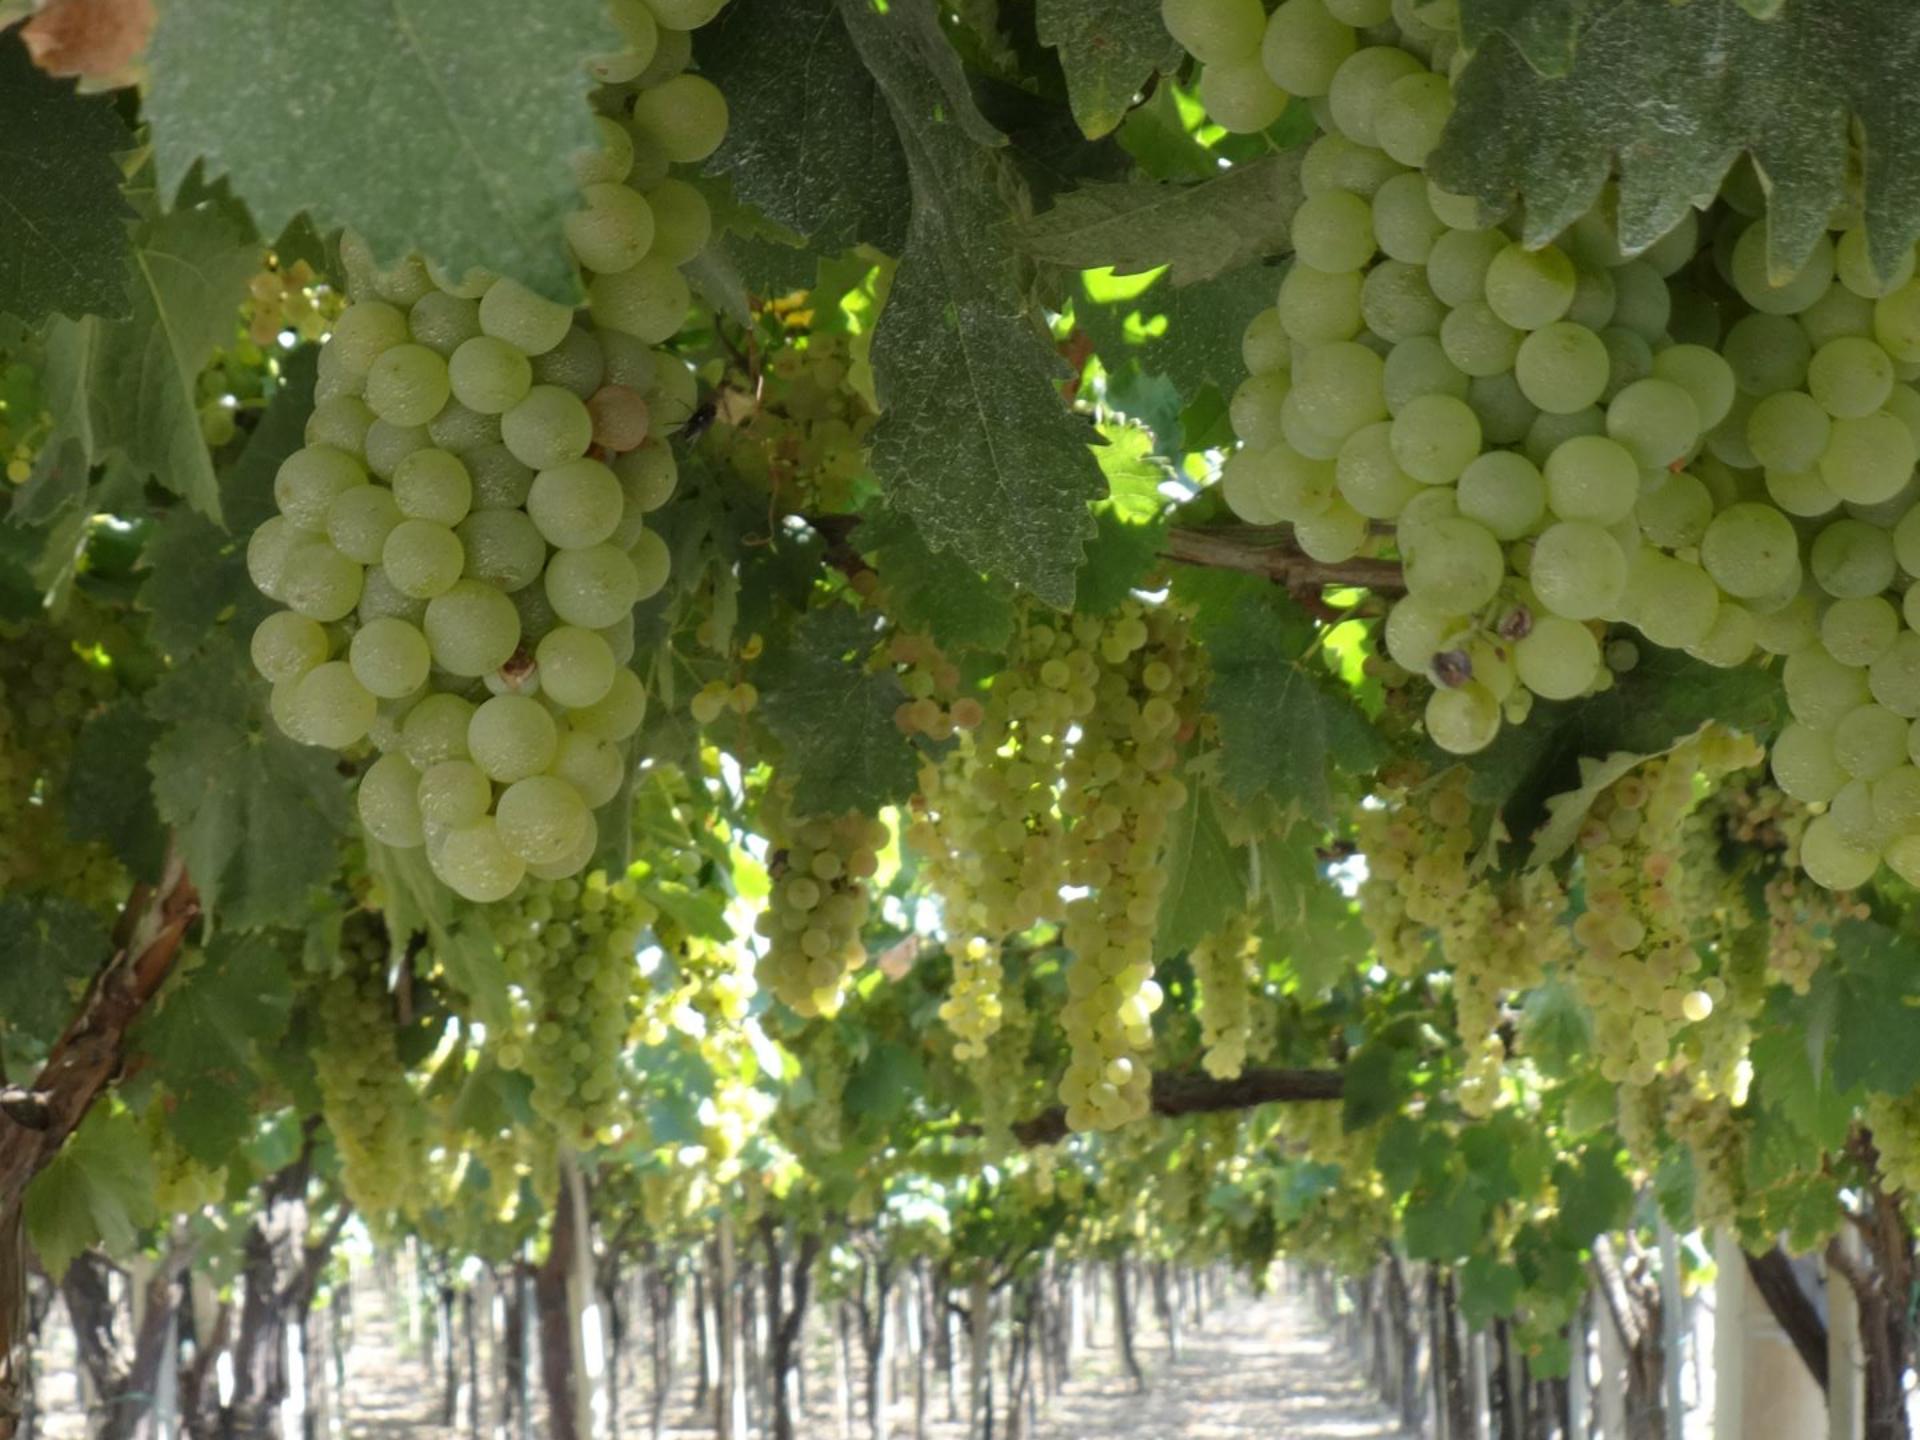 tuscany-vineyard-excursion-2